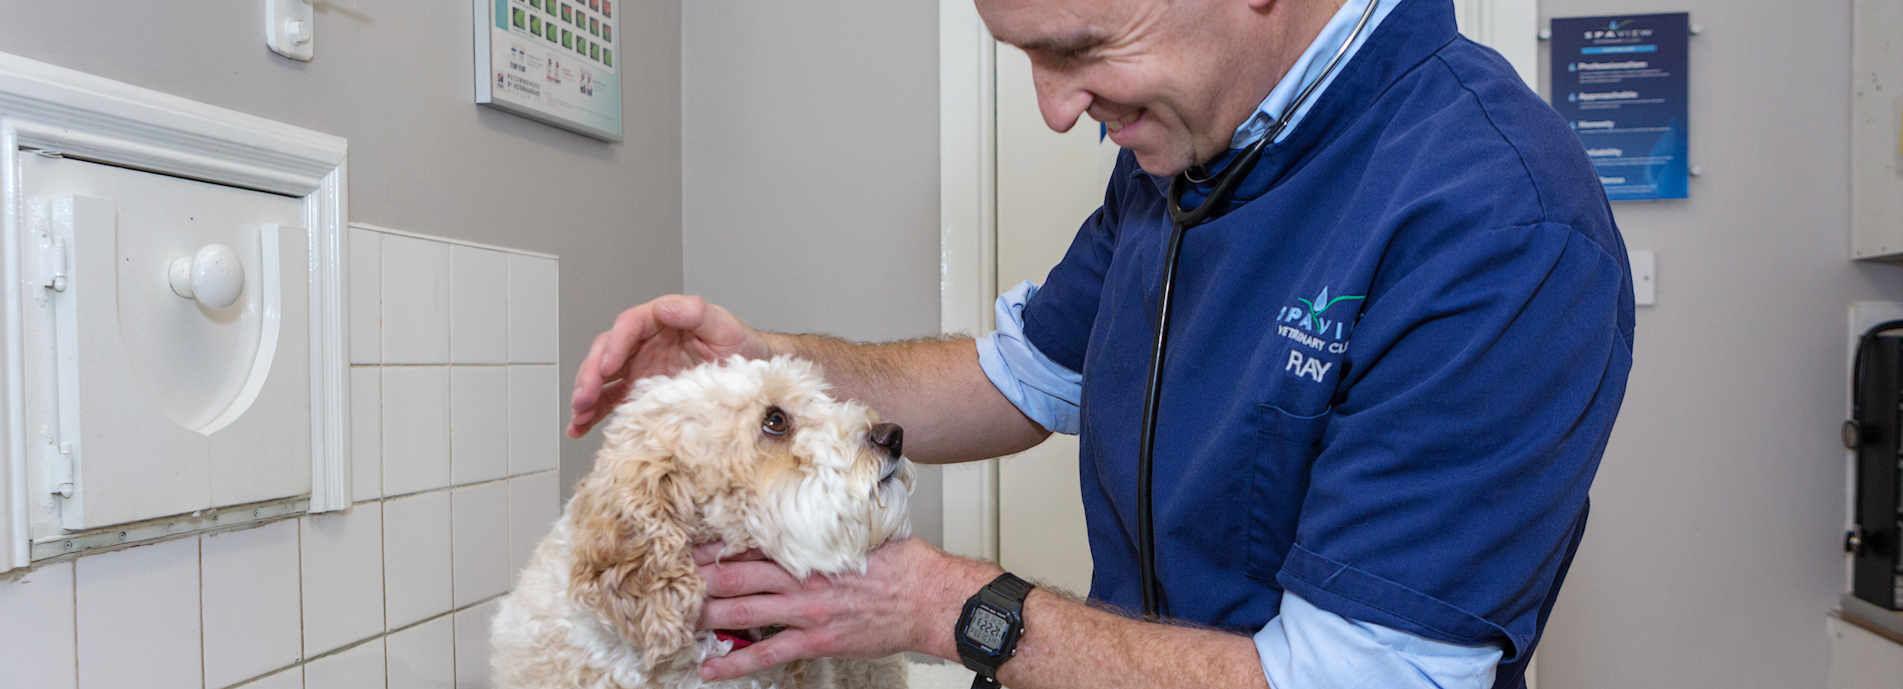 Spa View Veterinary Clinics